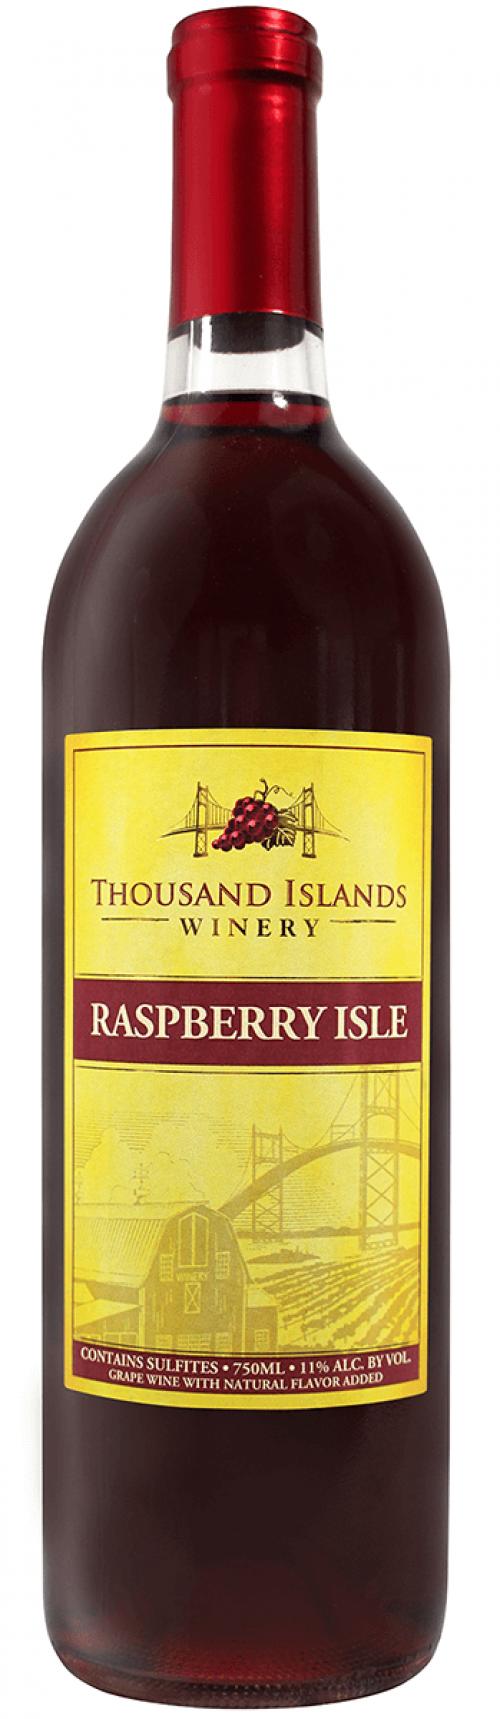 Thousand Islands Raspberry Isle 750ml NV